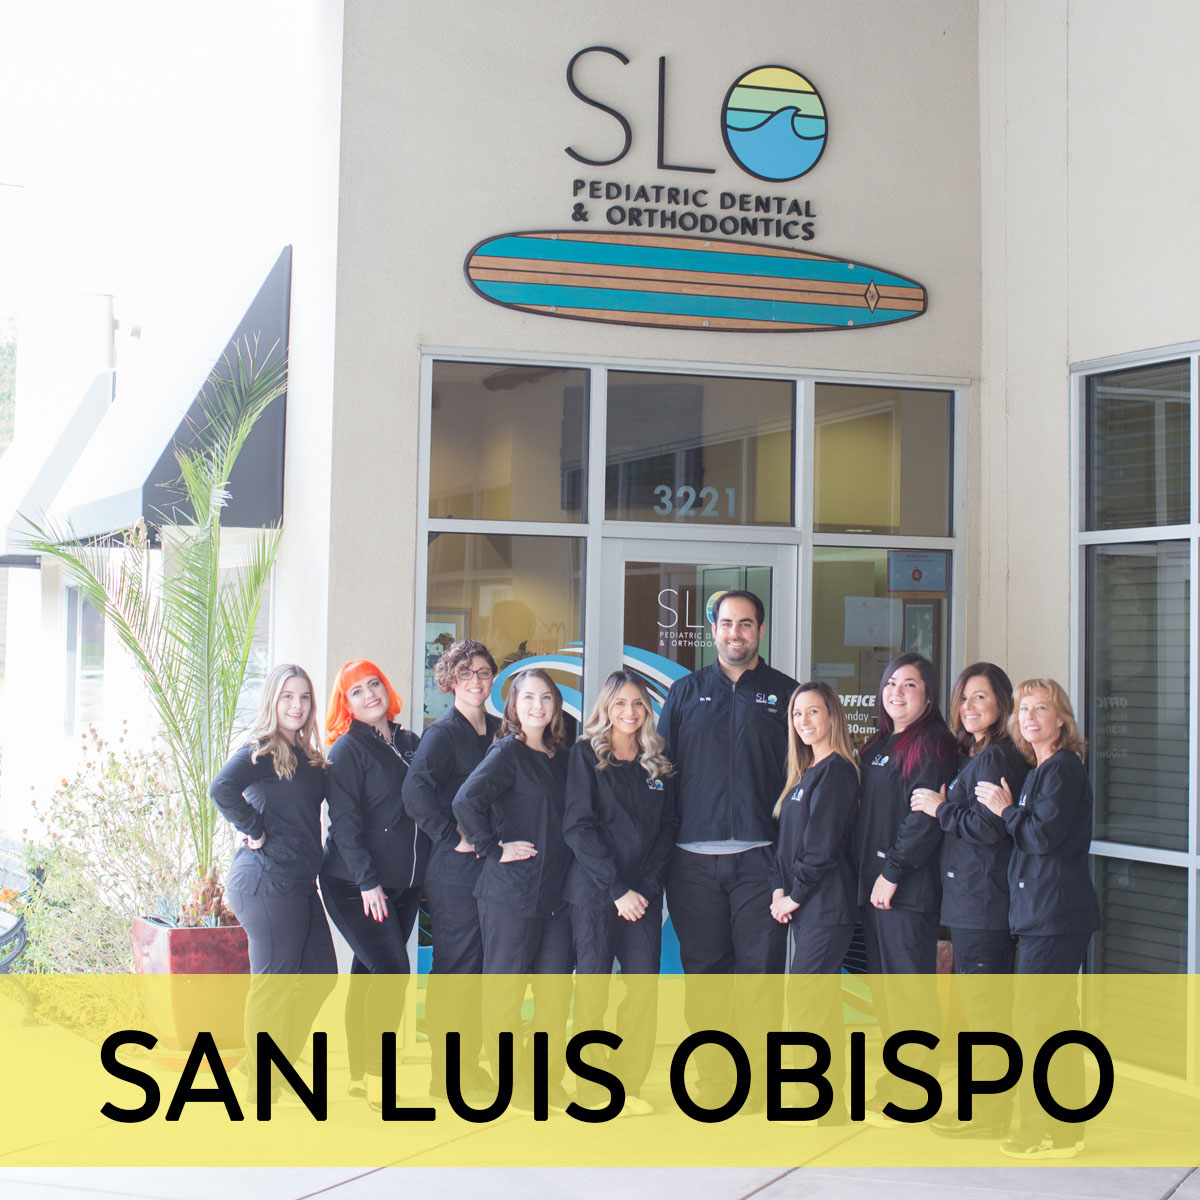 san luis obispo office location.jpg